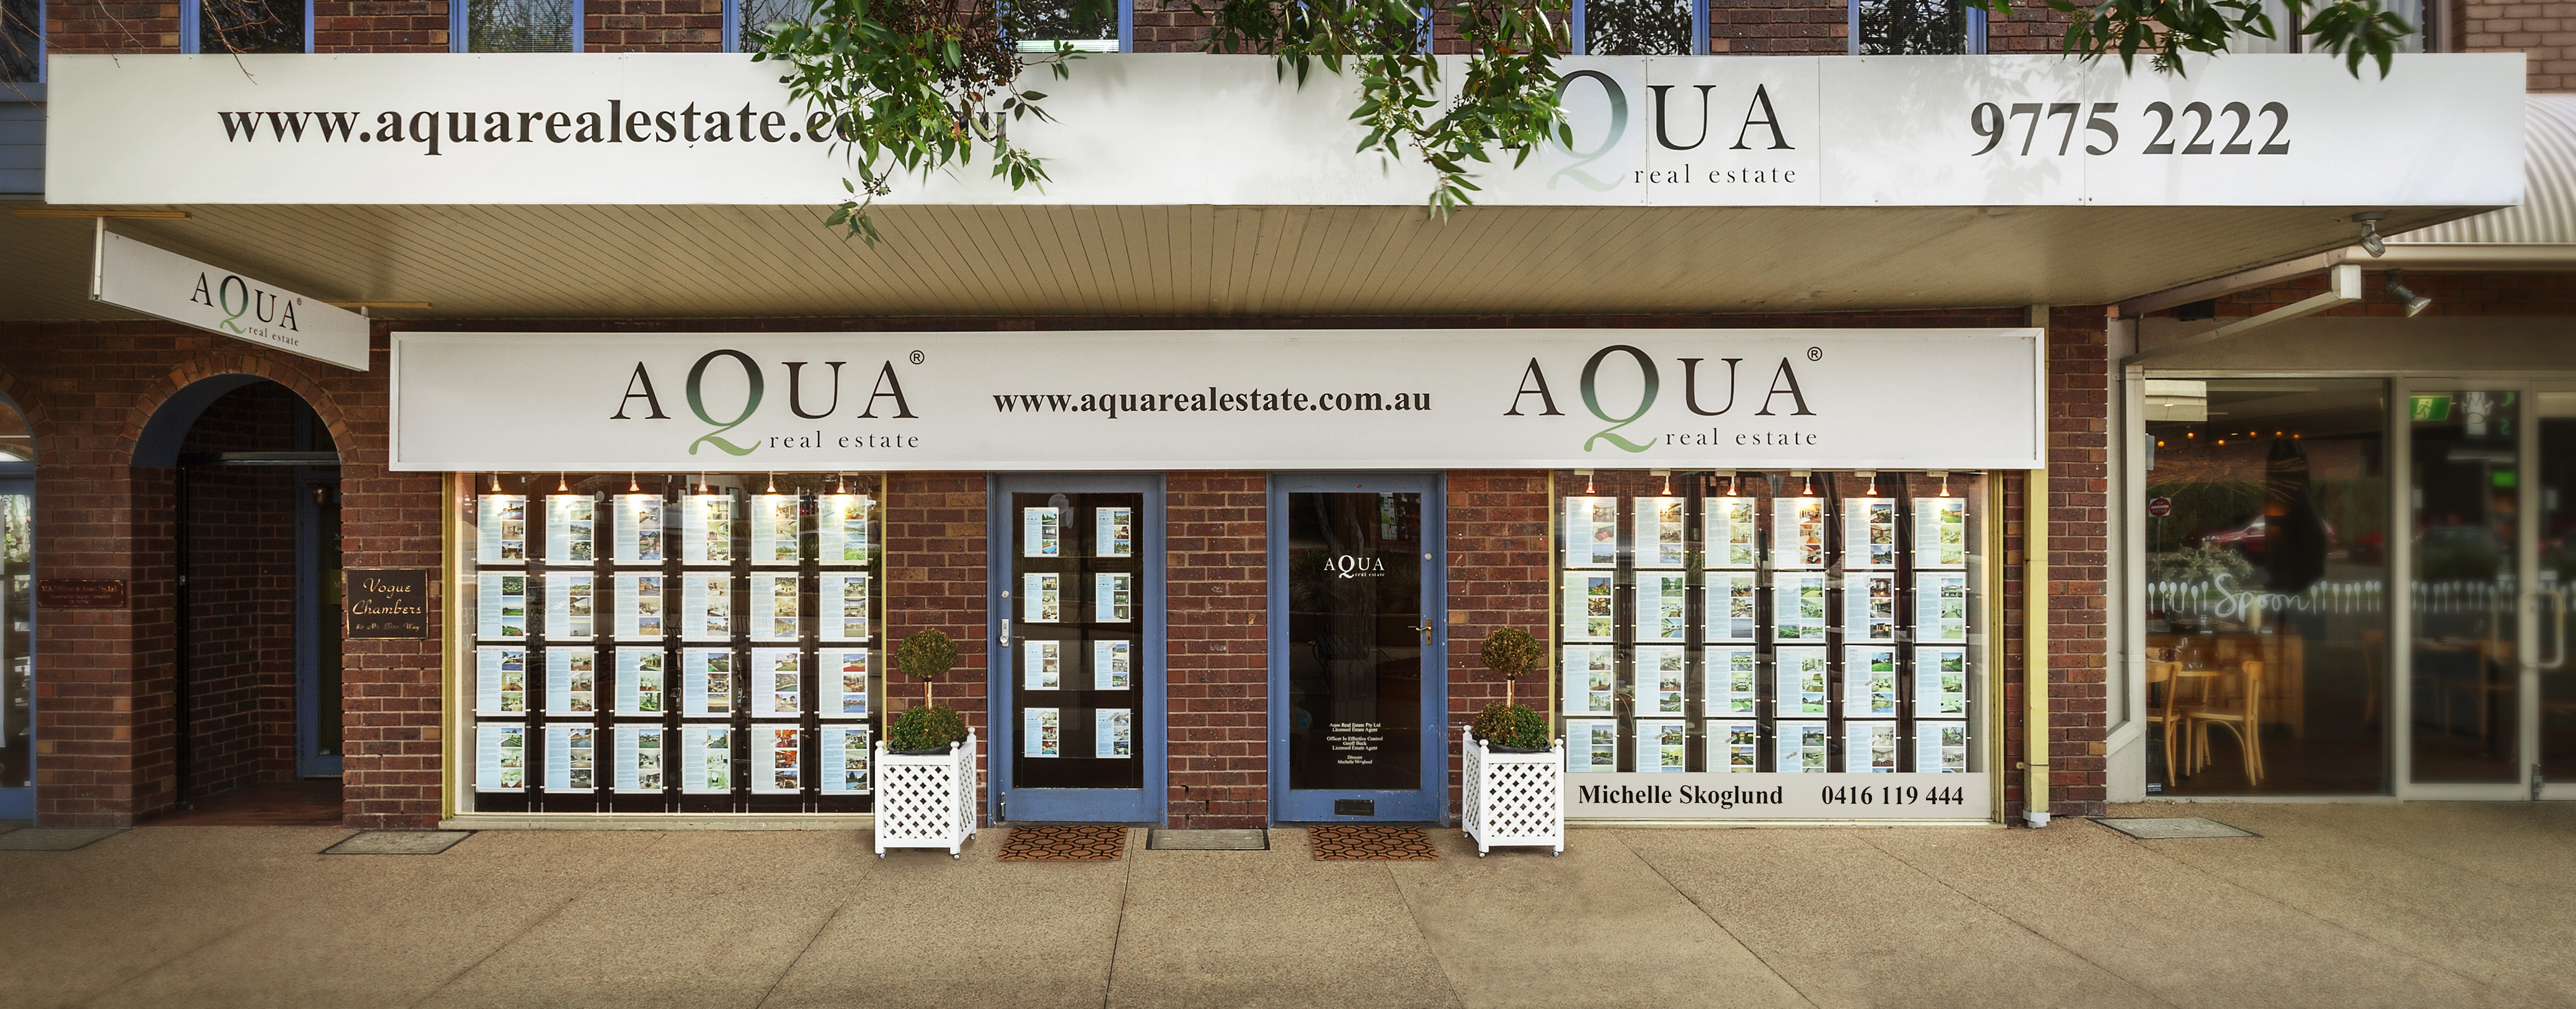 Aqua_Office_013ab